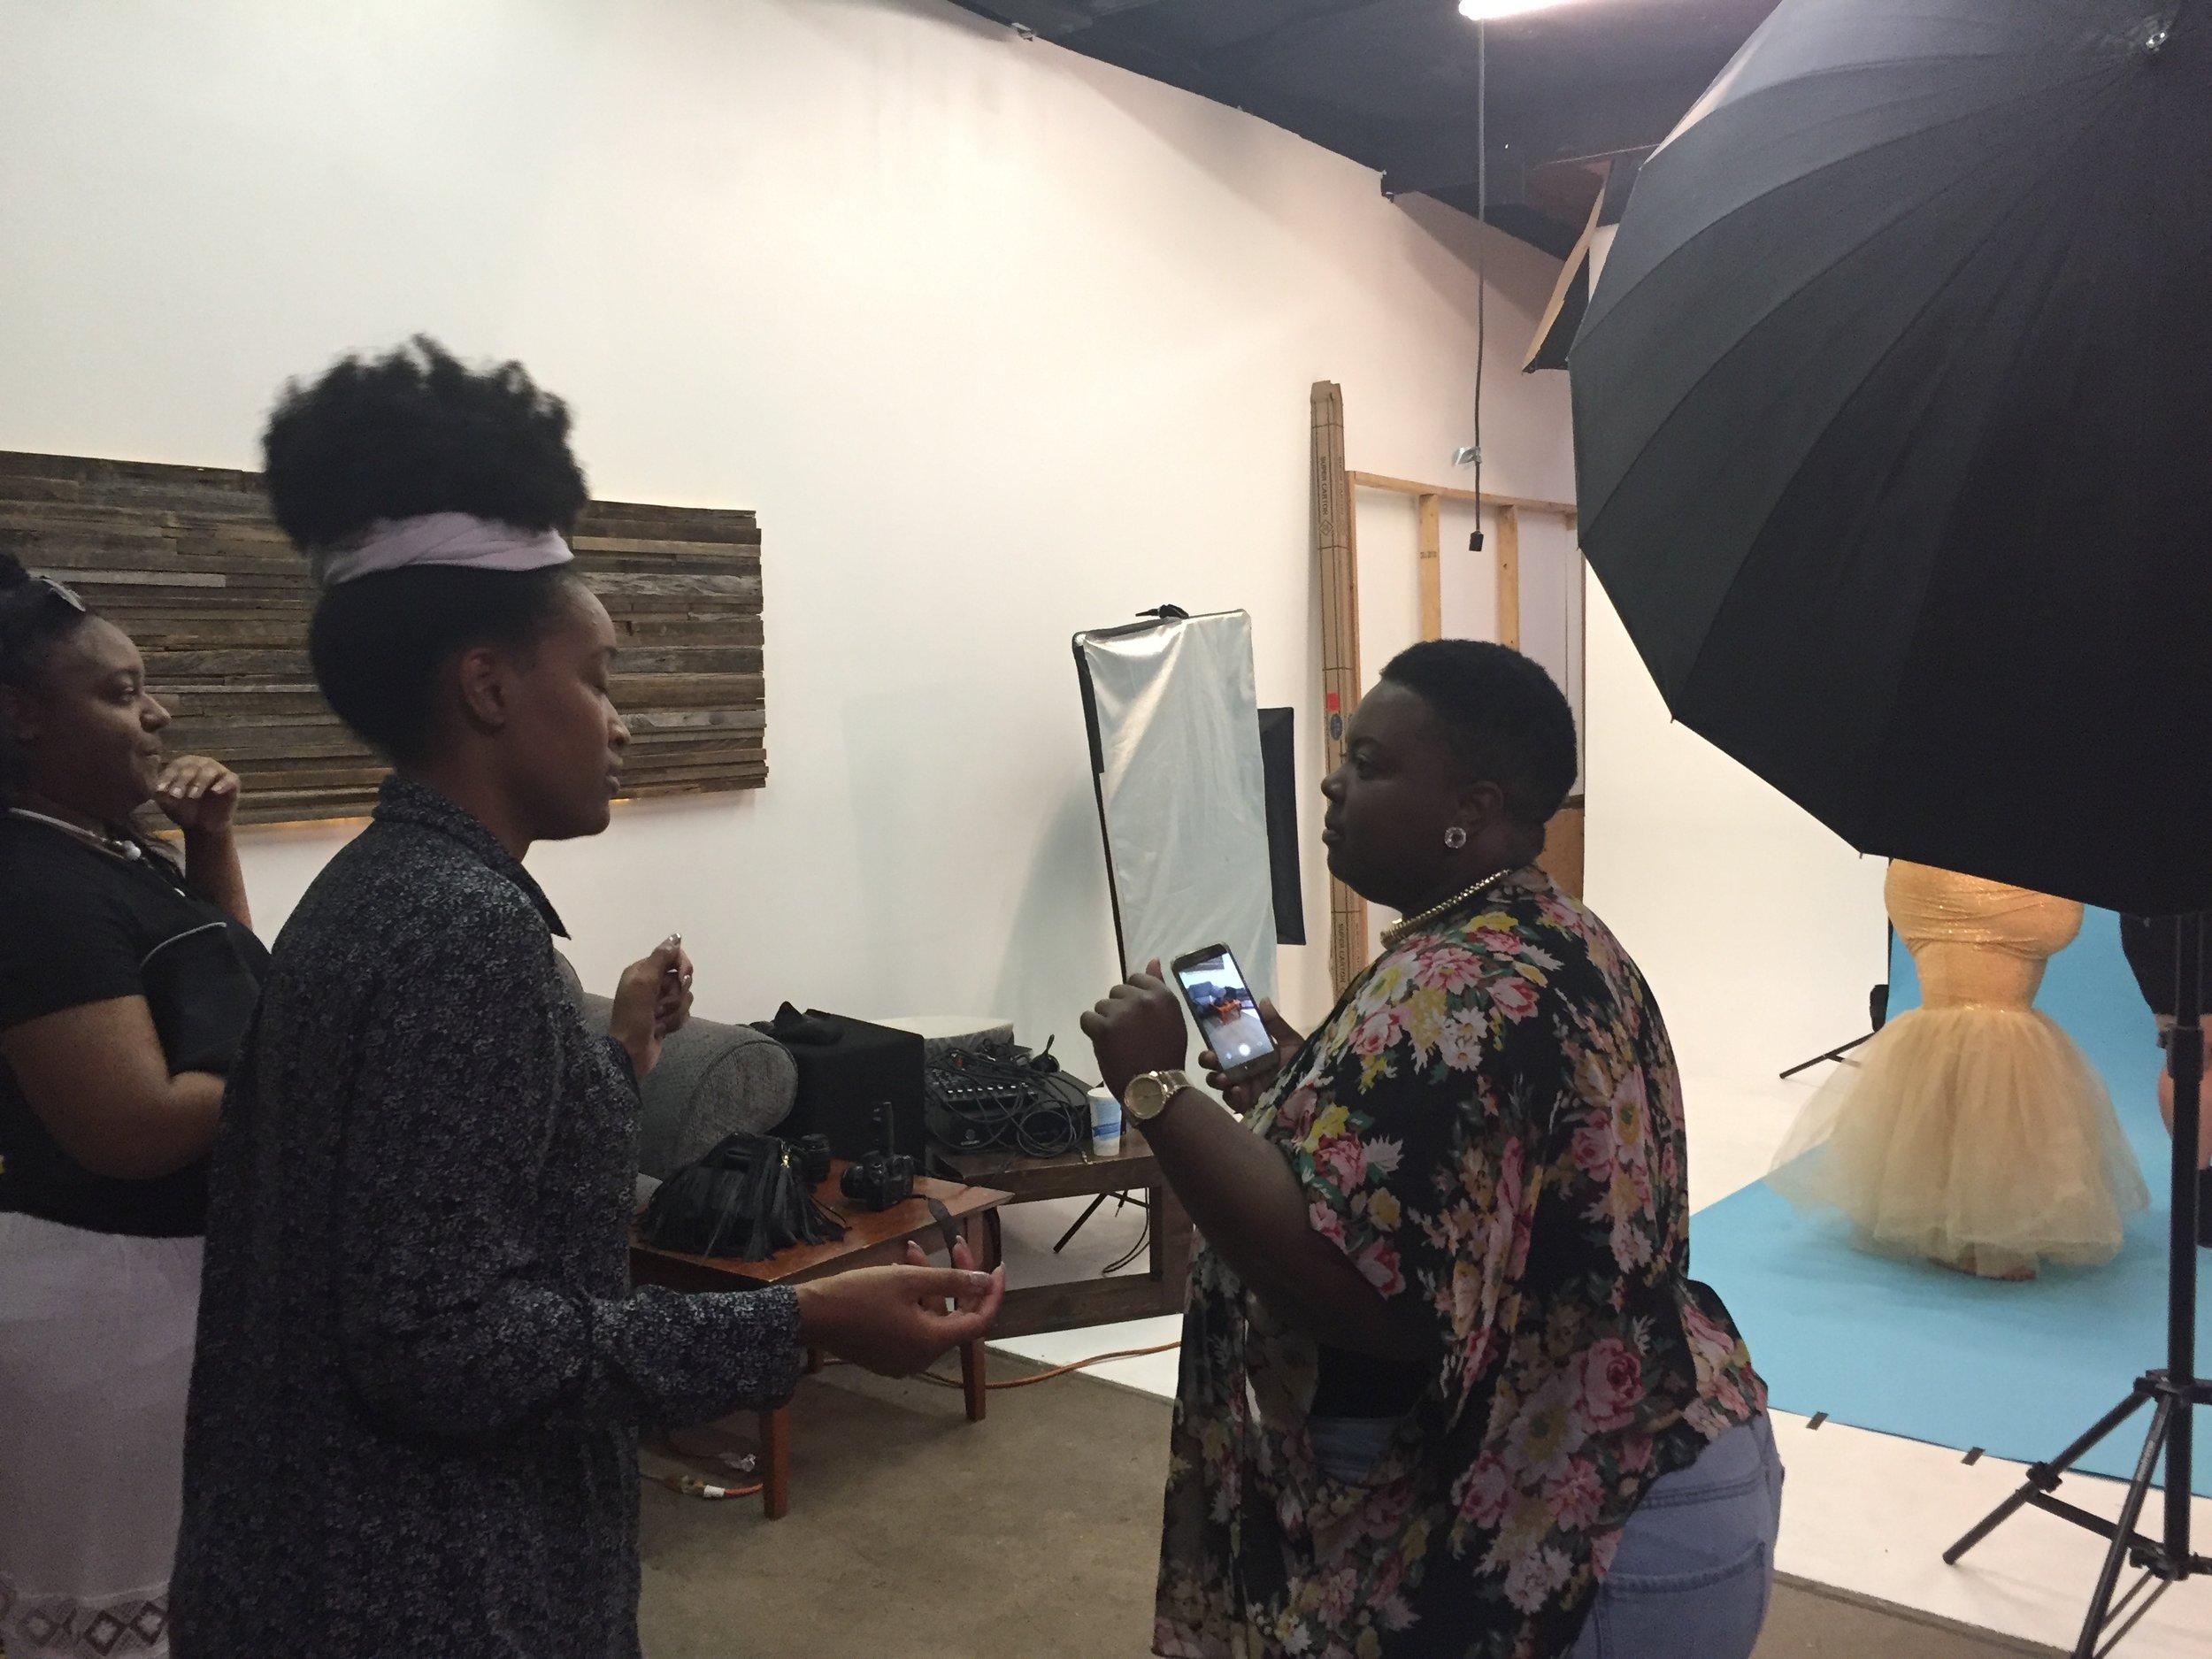 Deanna S Reid, The Social Photog behind the scenes for #azCurves Photo Campaign